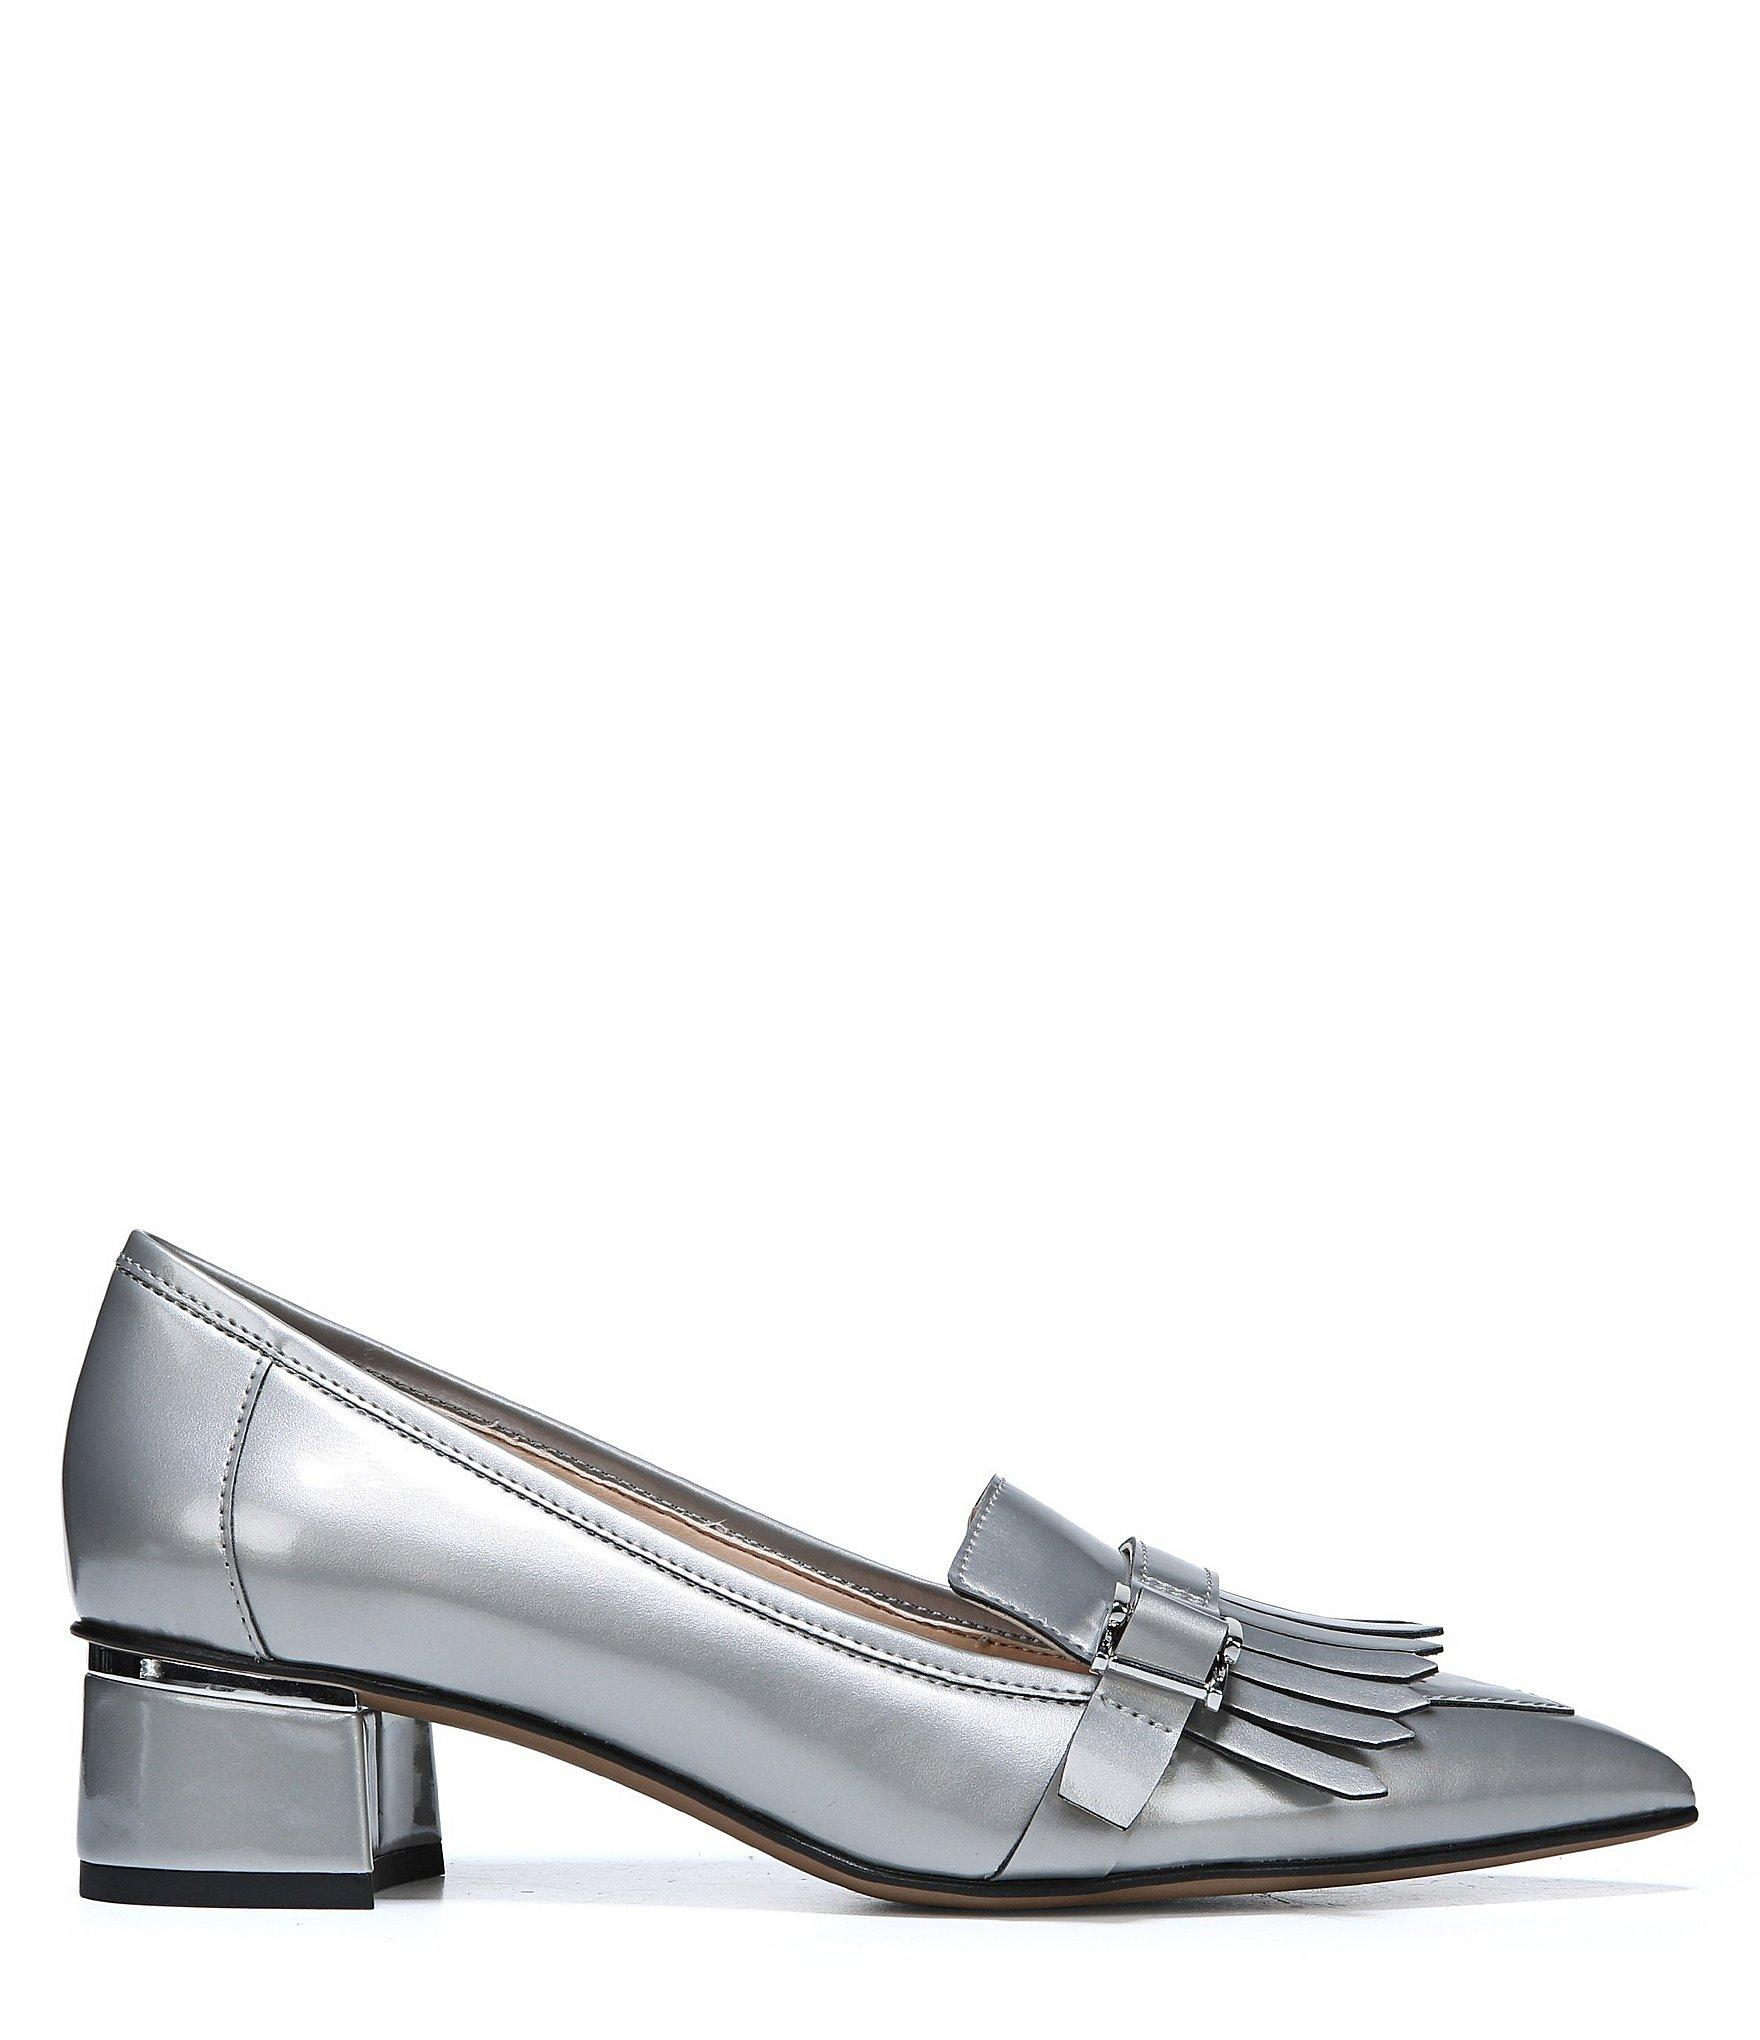 e9c70bbd38c Lyst - Franco Sarto Grenoble Keltie Patent Leather Block Heel Penny ...